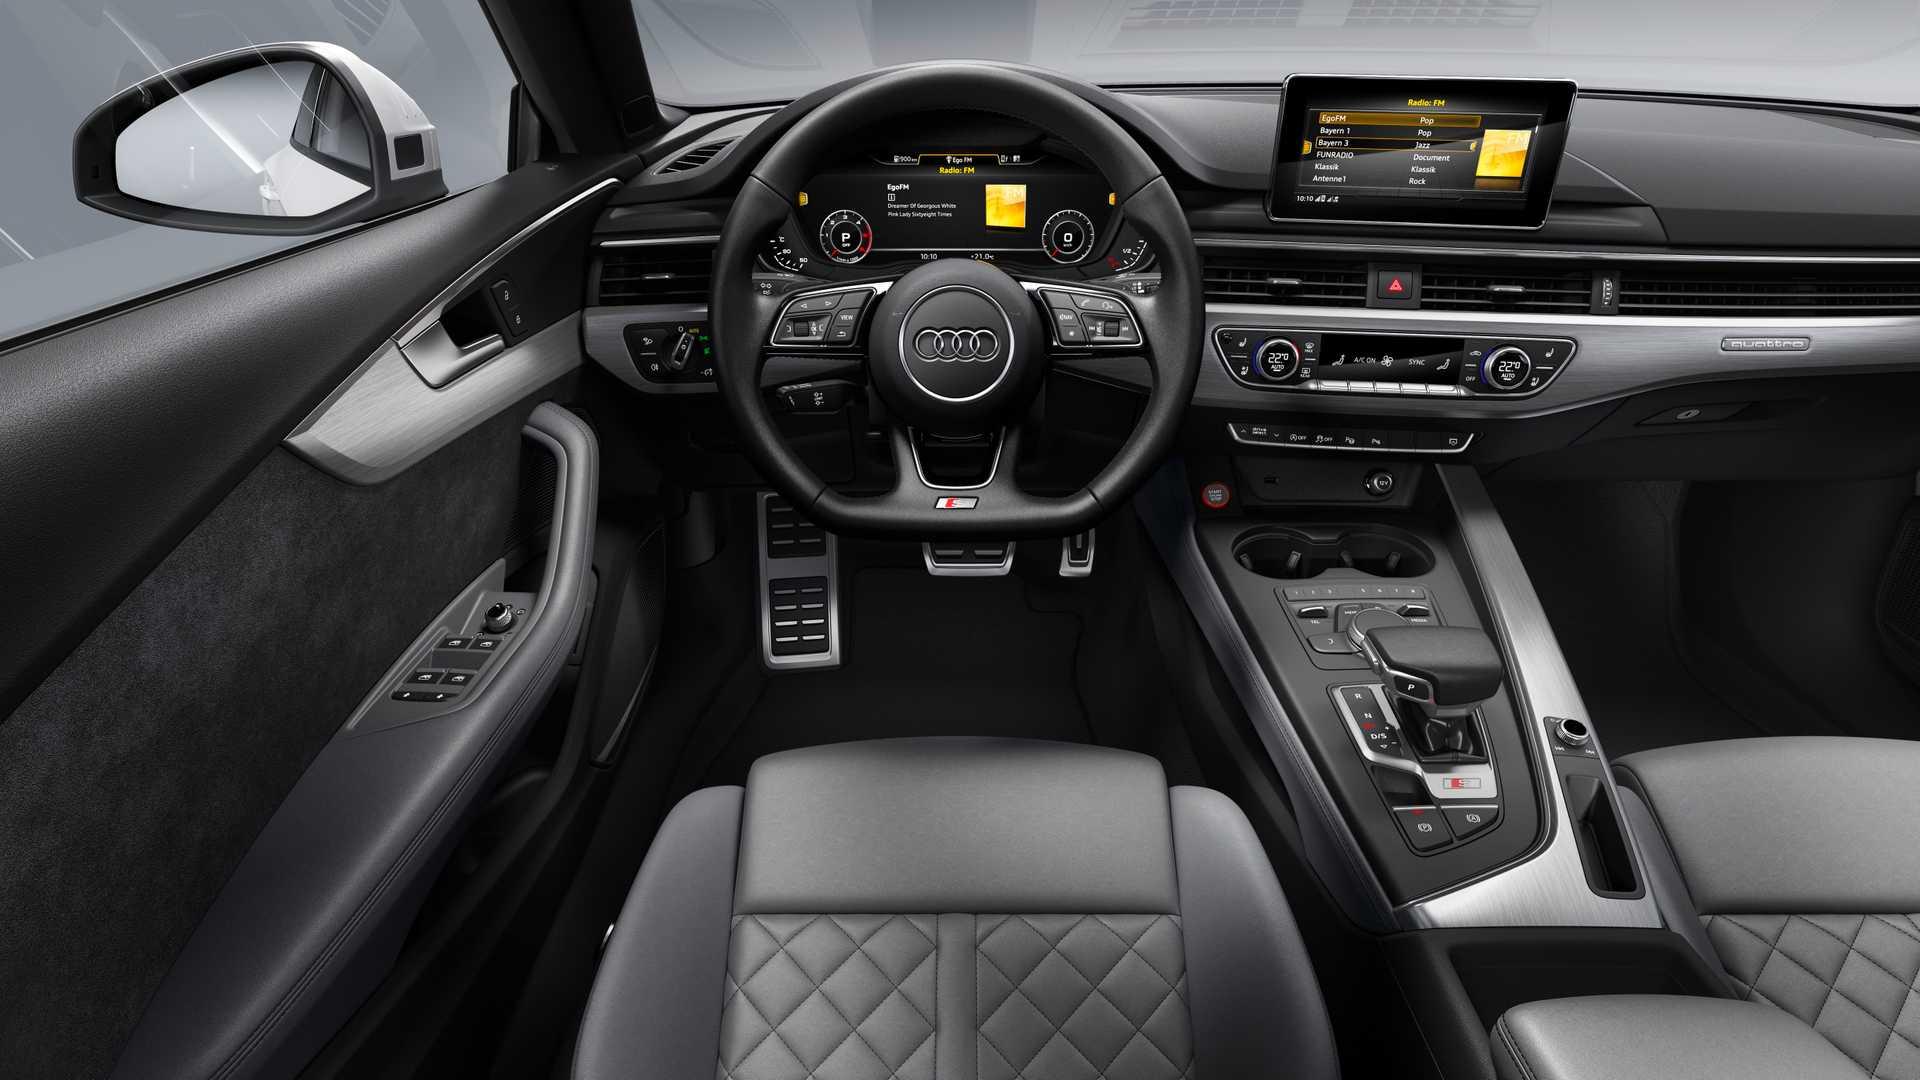 2019 Audi S5 Sportback TDI Interior Cockpit Wallpaper (15)